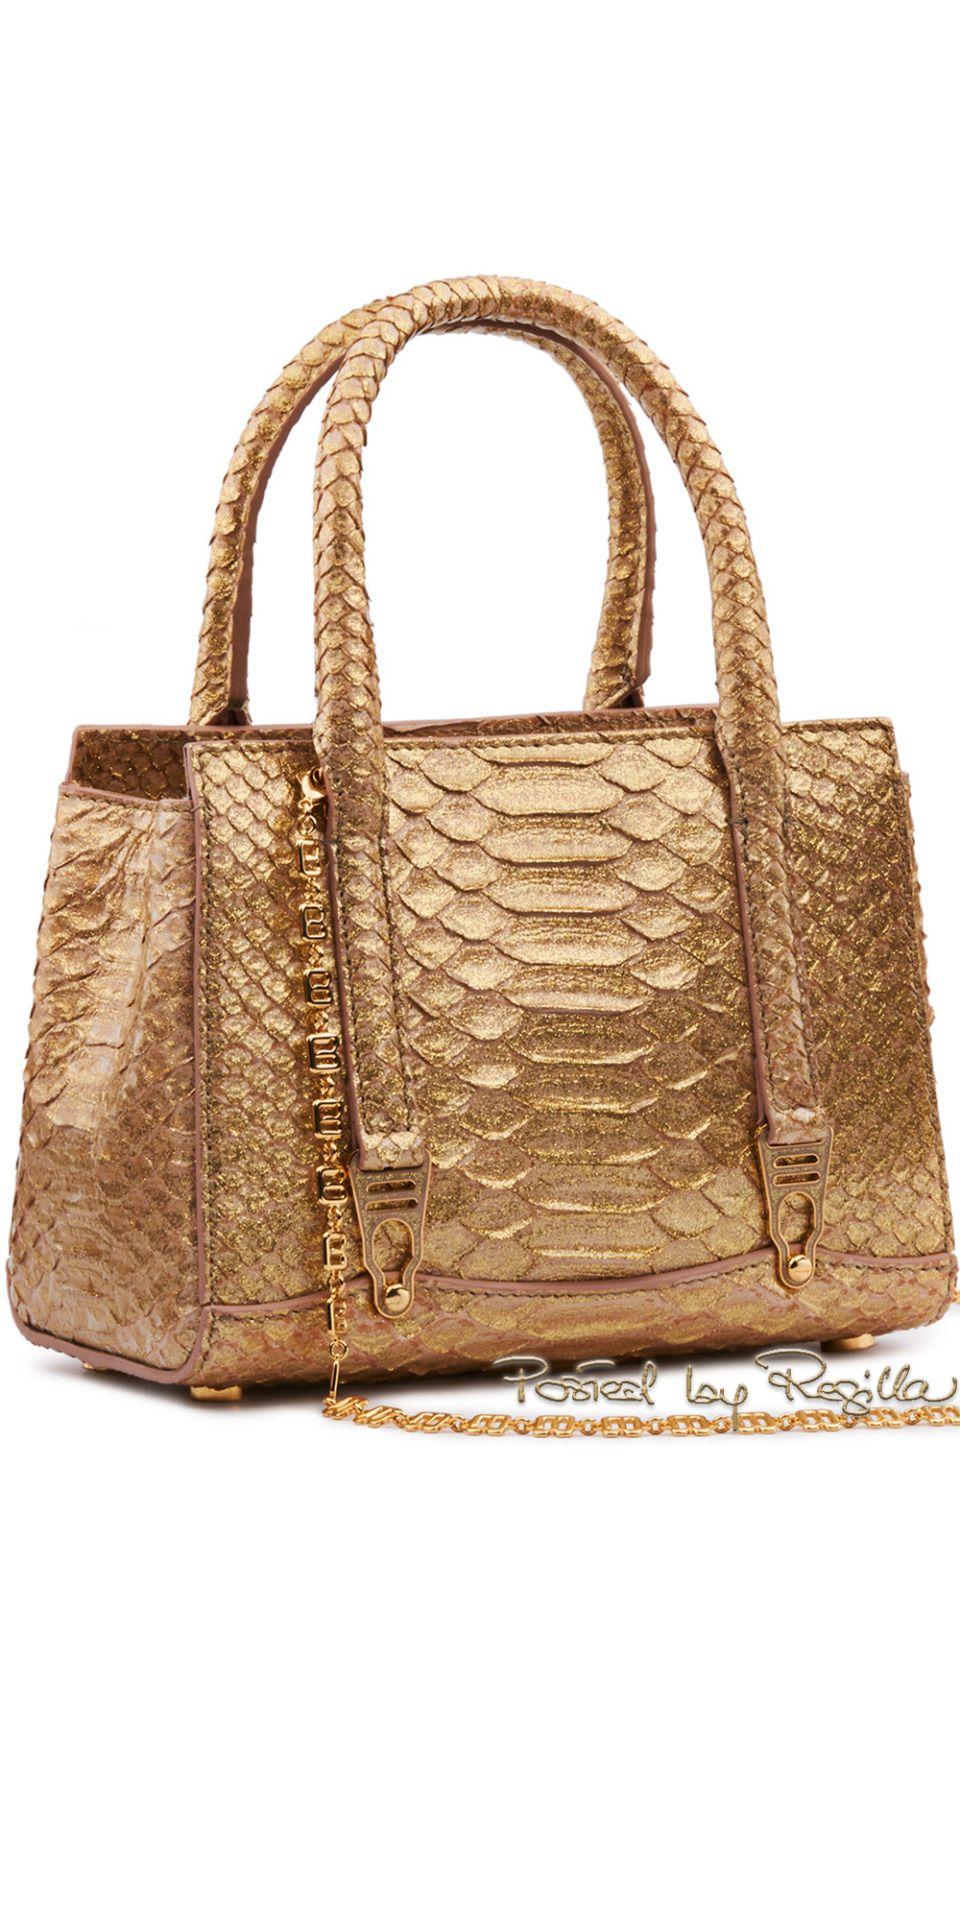 Regilla La Perla Luxury Bags Leather Handbags Clutches Dream